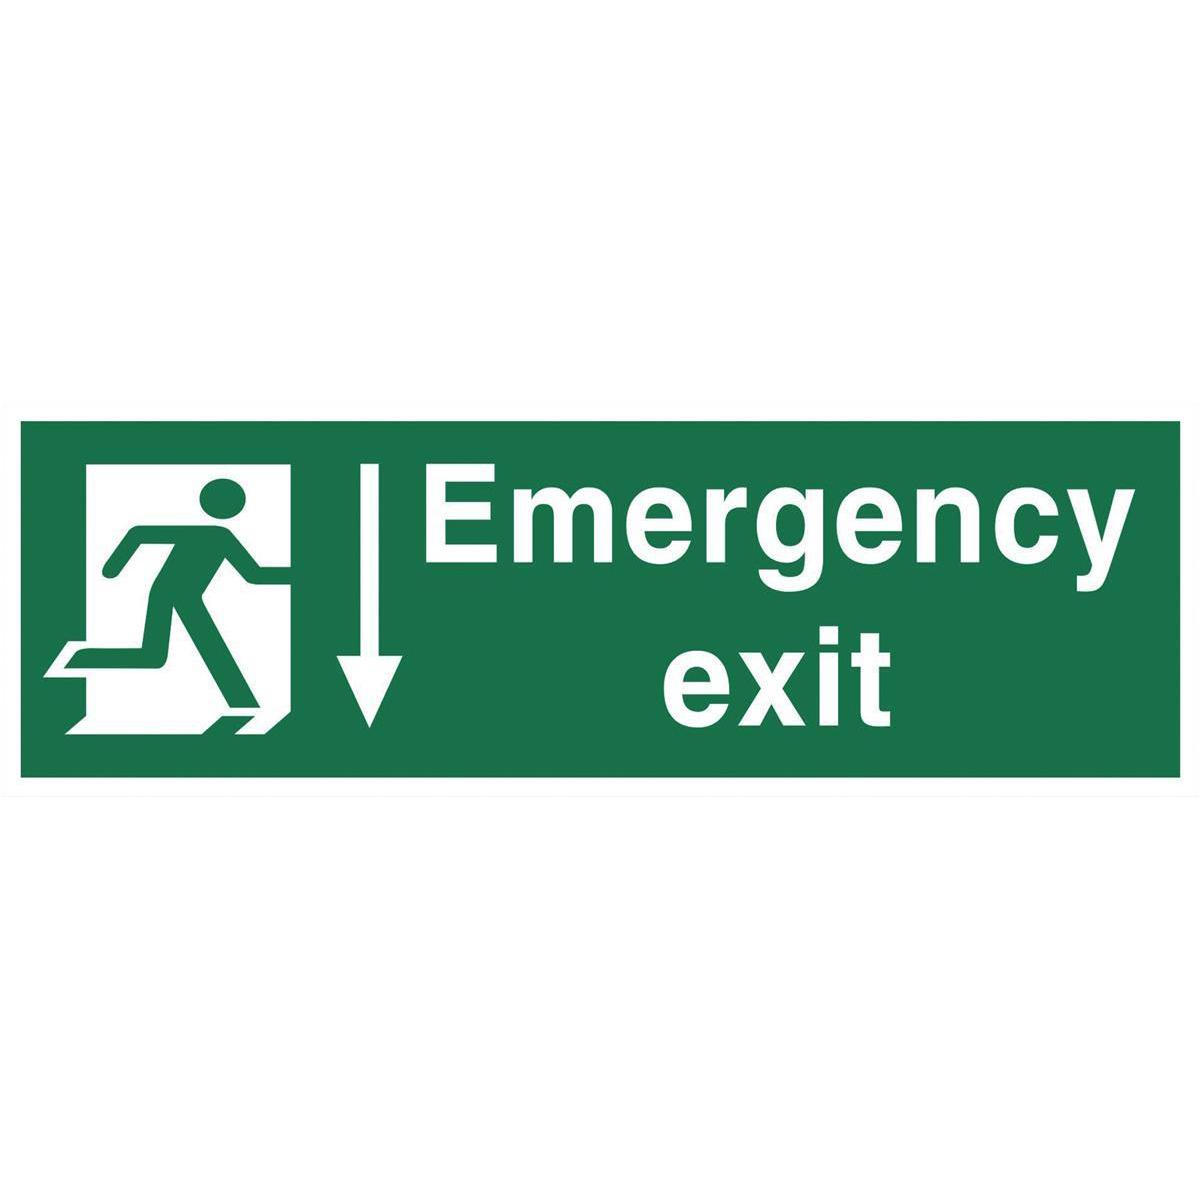 Emergency Exit Books Nicor Sign Wiring Diagram Stewart Superior Fire Self Adhesive Vinyl Ref Sav 1200x1200